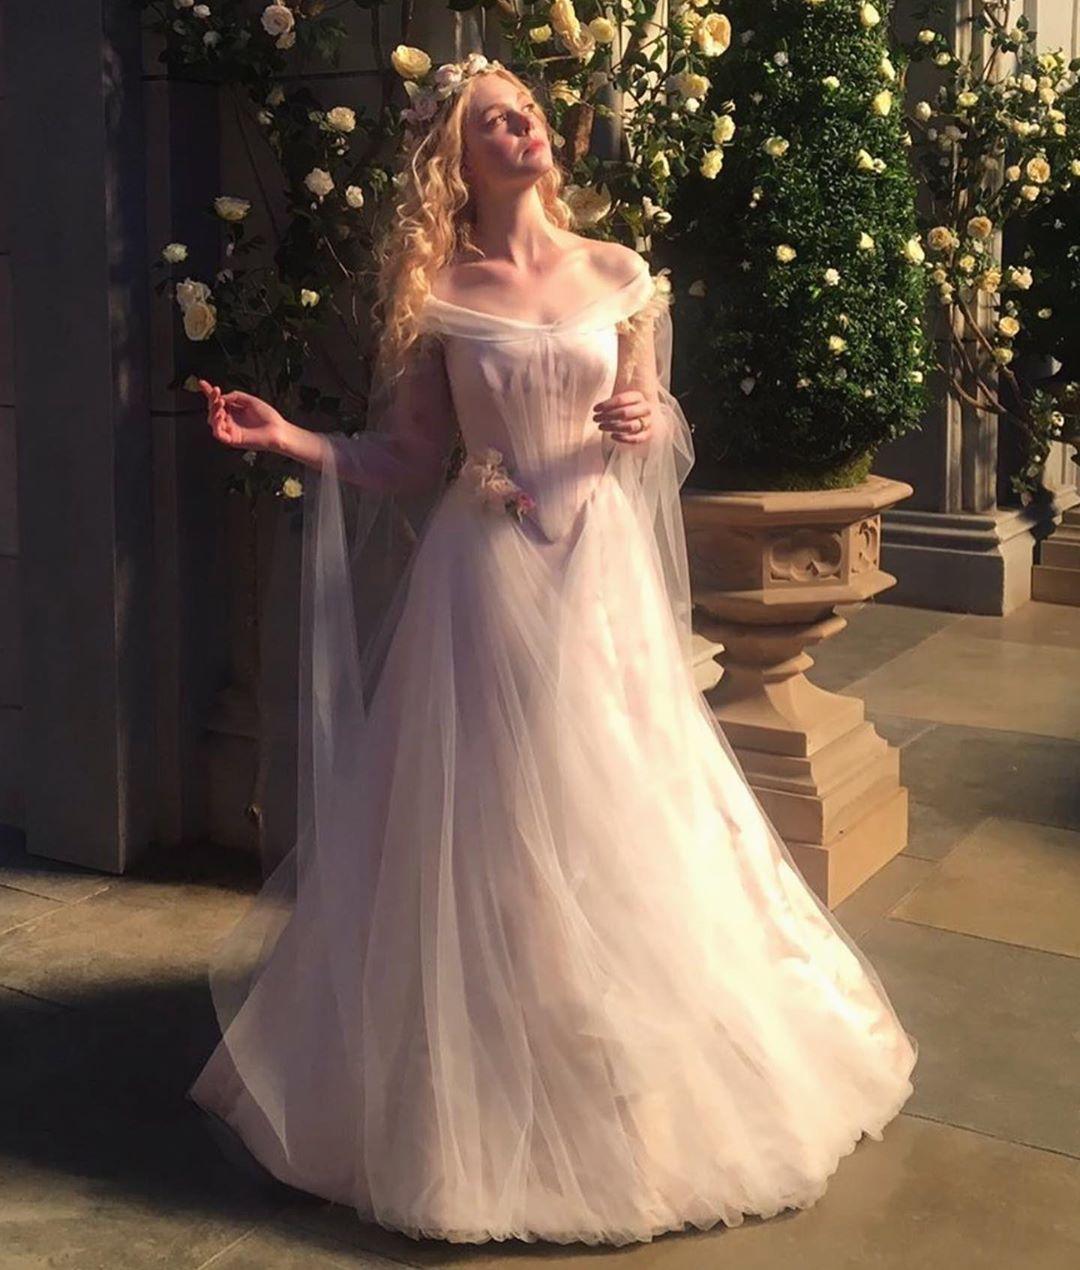 "The Catwalk Italia – TCI on Instagram: ""#ellefanning wedding dress in #maleficent 👍🏼or👎🏼?"" – Karis – Nymph"